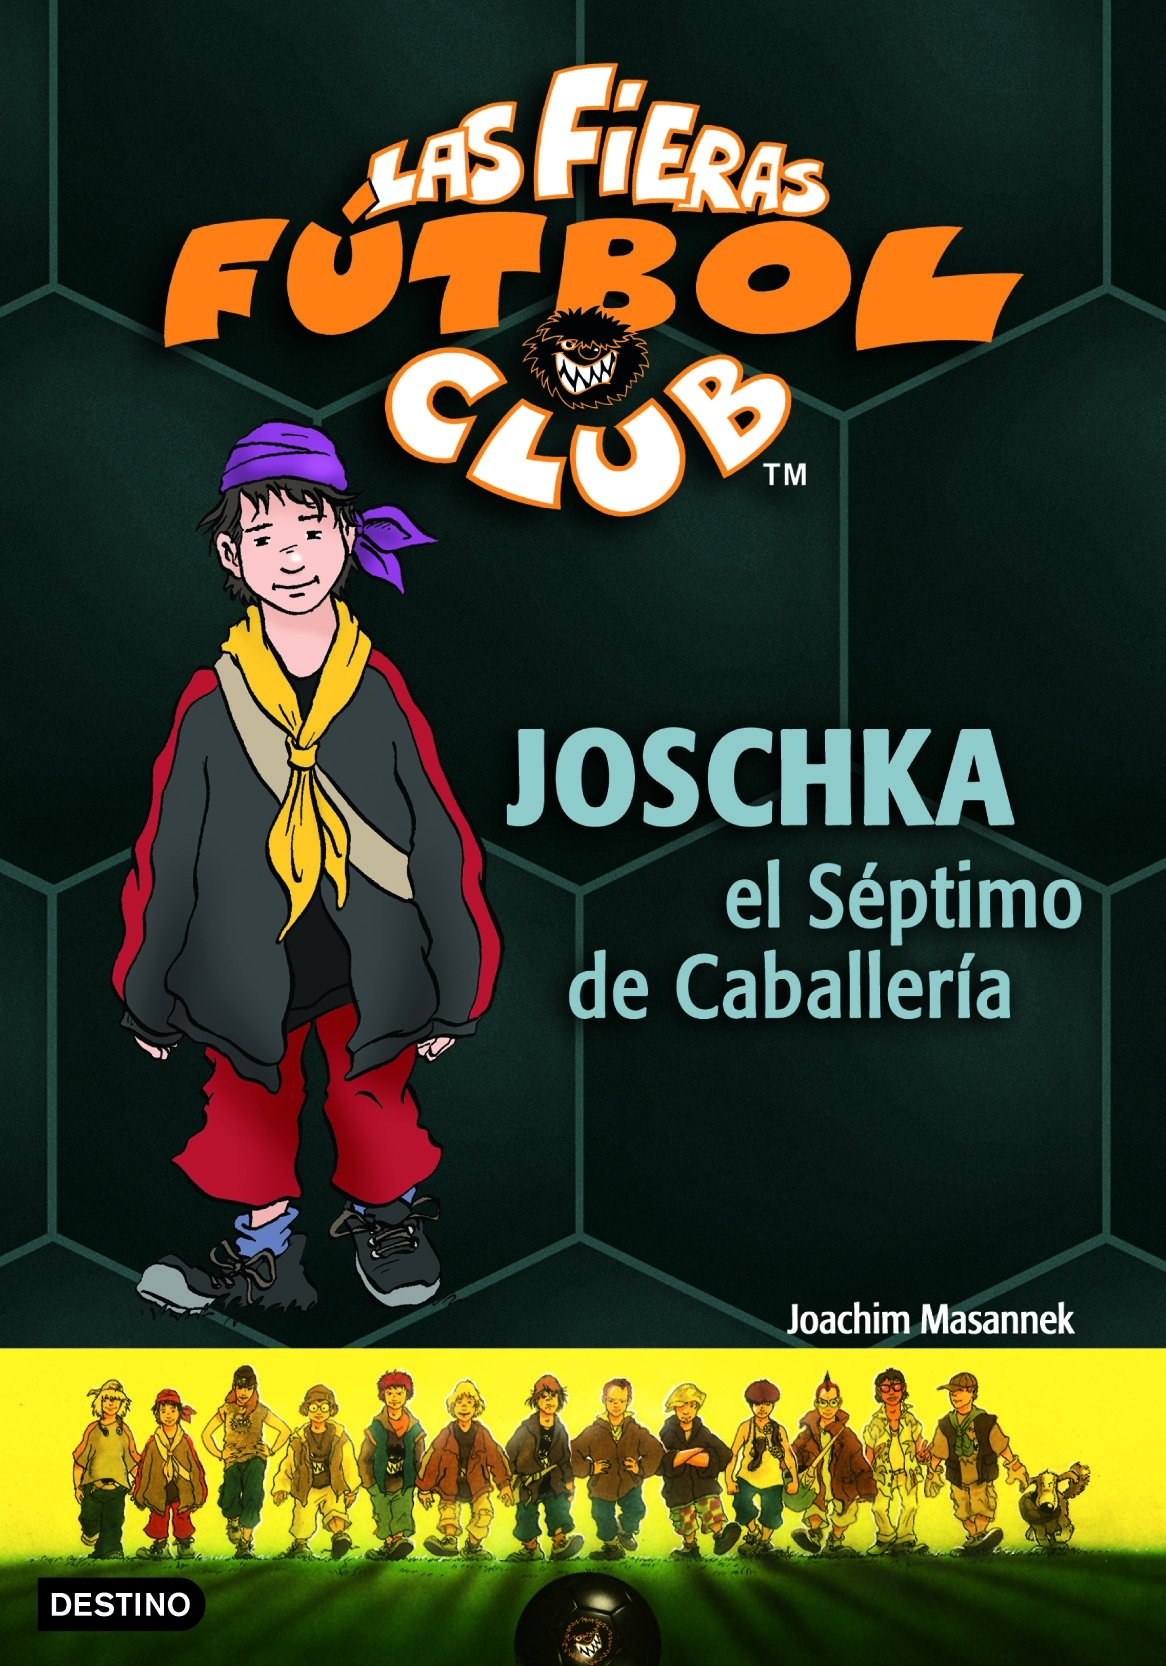 Ff9 Joschka El Septimo Caballeria product image